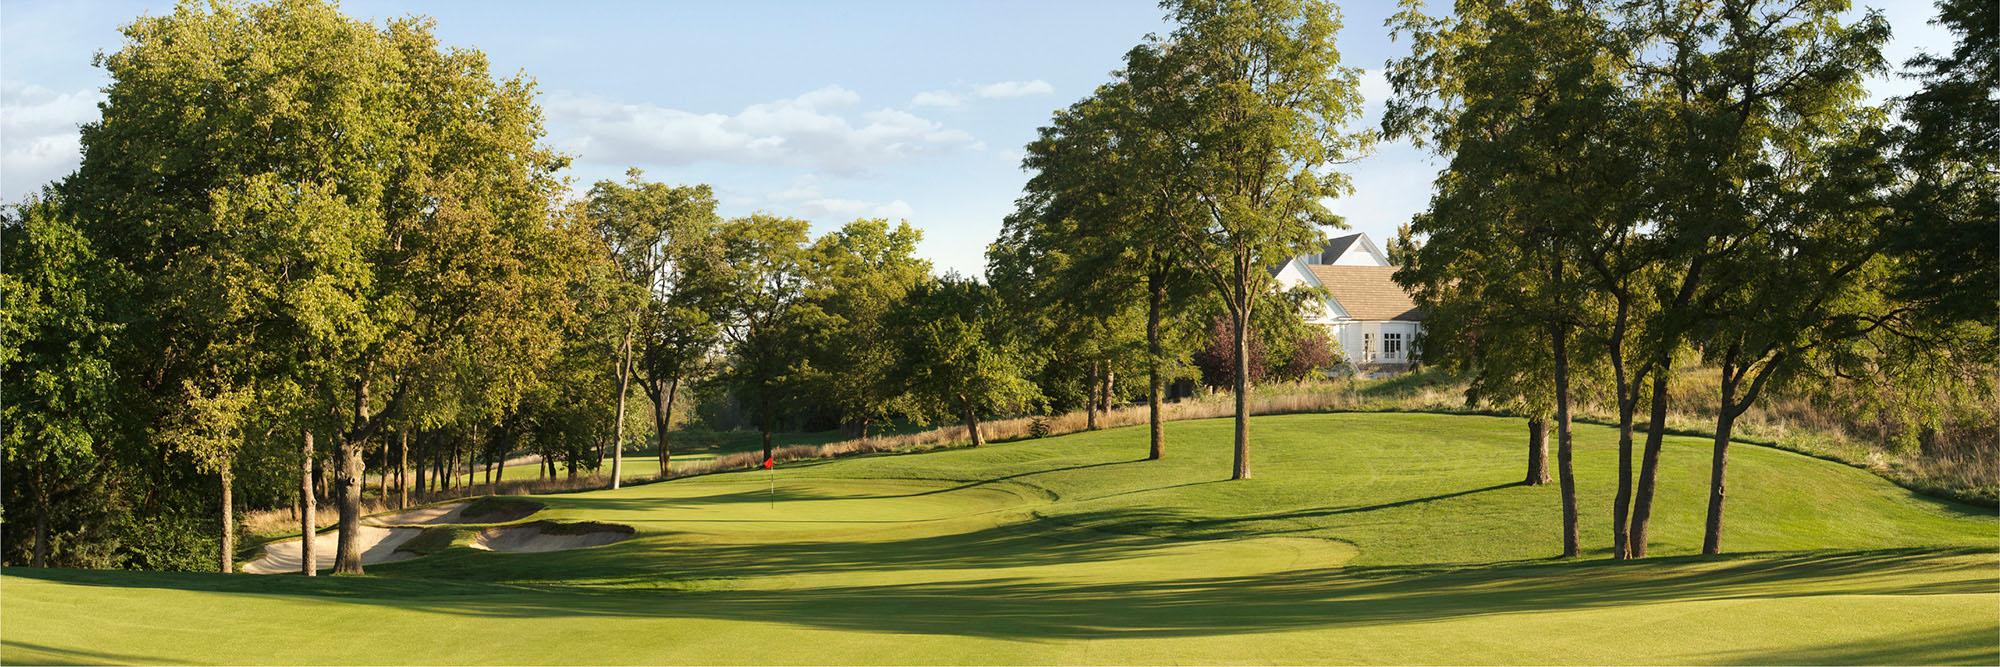 Golf Course Image - Hallbrook No. 12